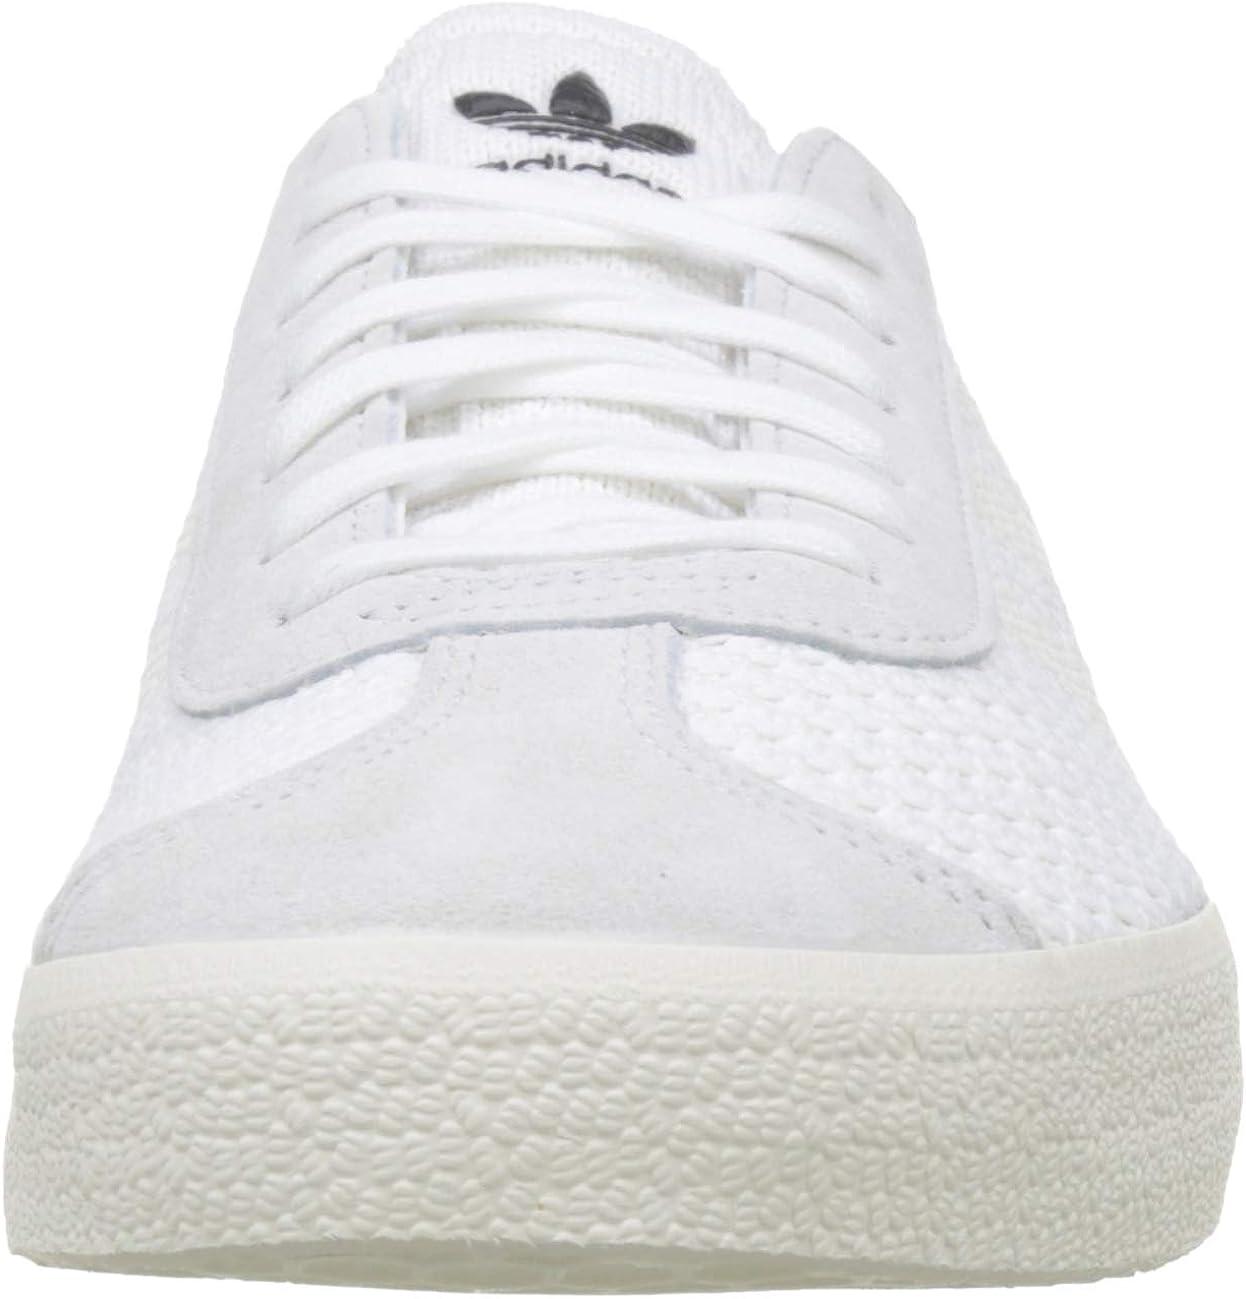 adidas Gazelle Primeknit, Baskets Basses Homme Multicolore (Ftwbla/Blatiz/Blatiz)